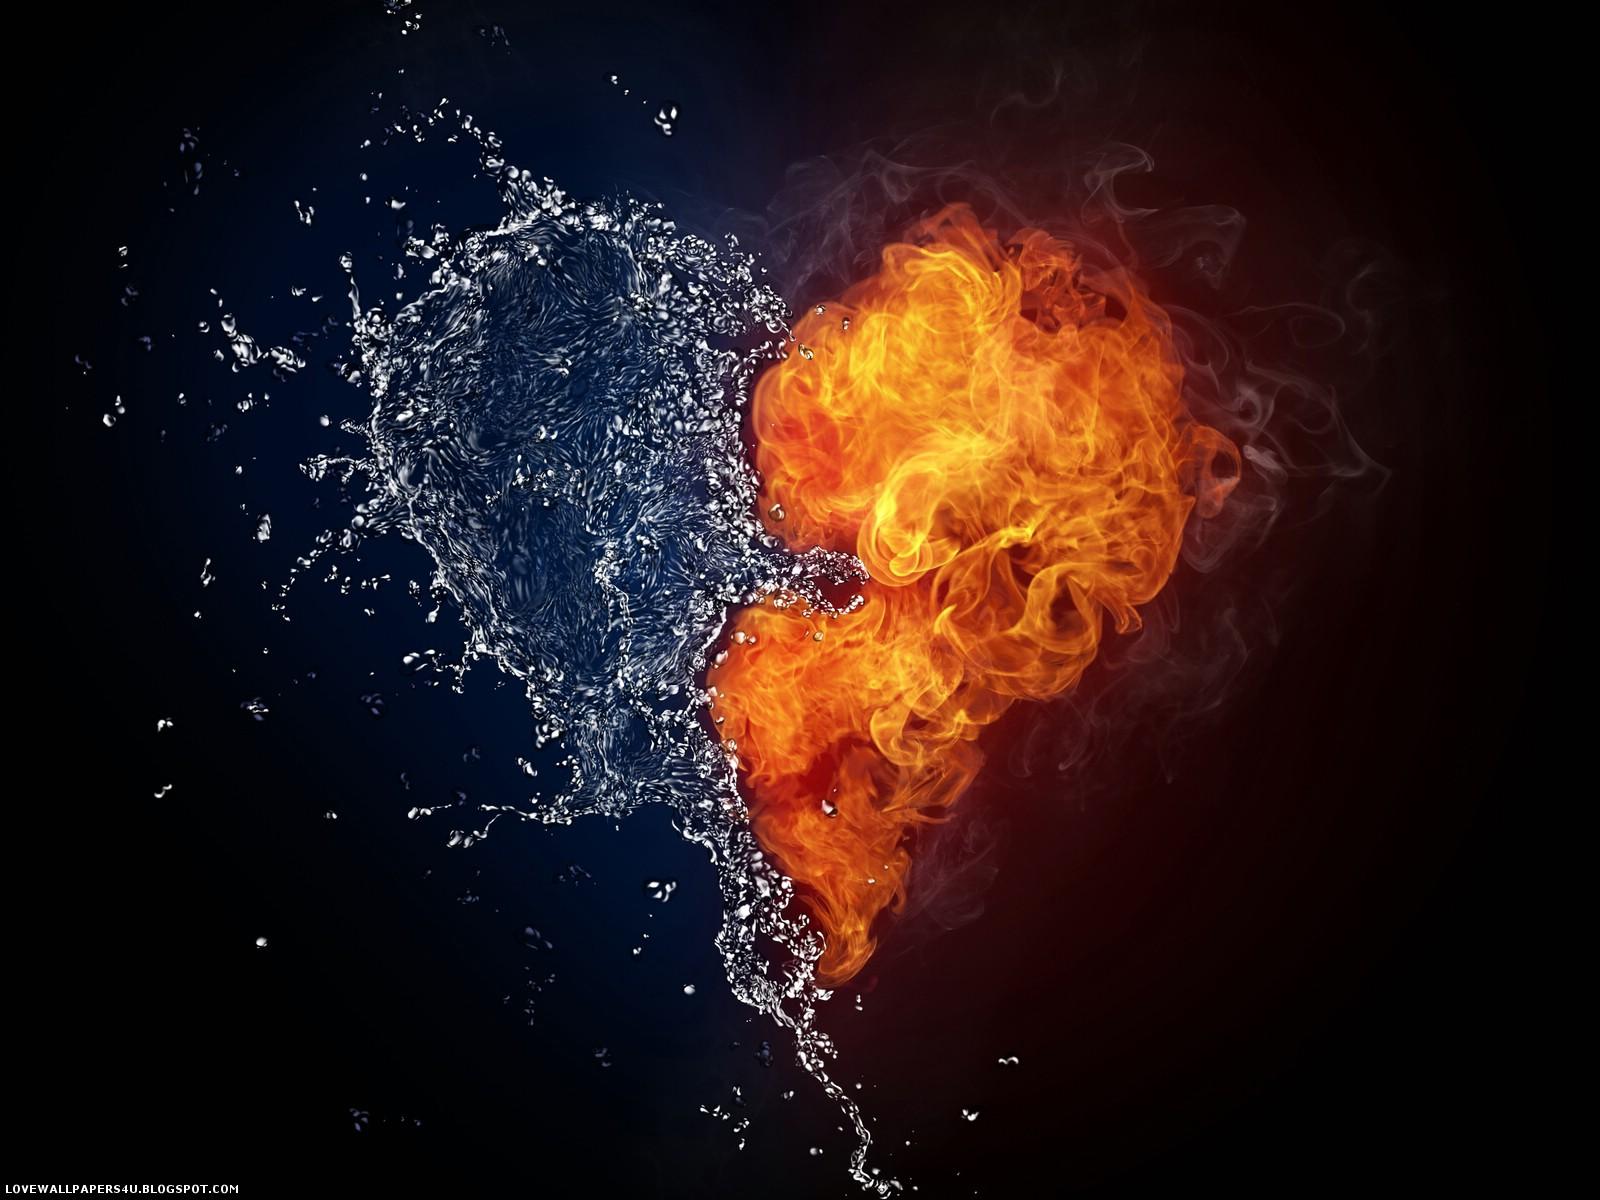 http://1.bp.blogspot.com/-h5JwYr3wADQ/T6N6F5u39CI/AAAAAAAAAYM/UaKmW7uIZio/s1600/water-and-fire-love.jpg